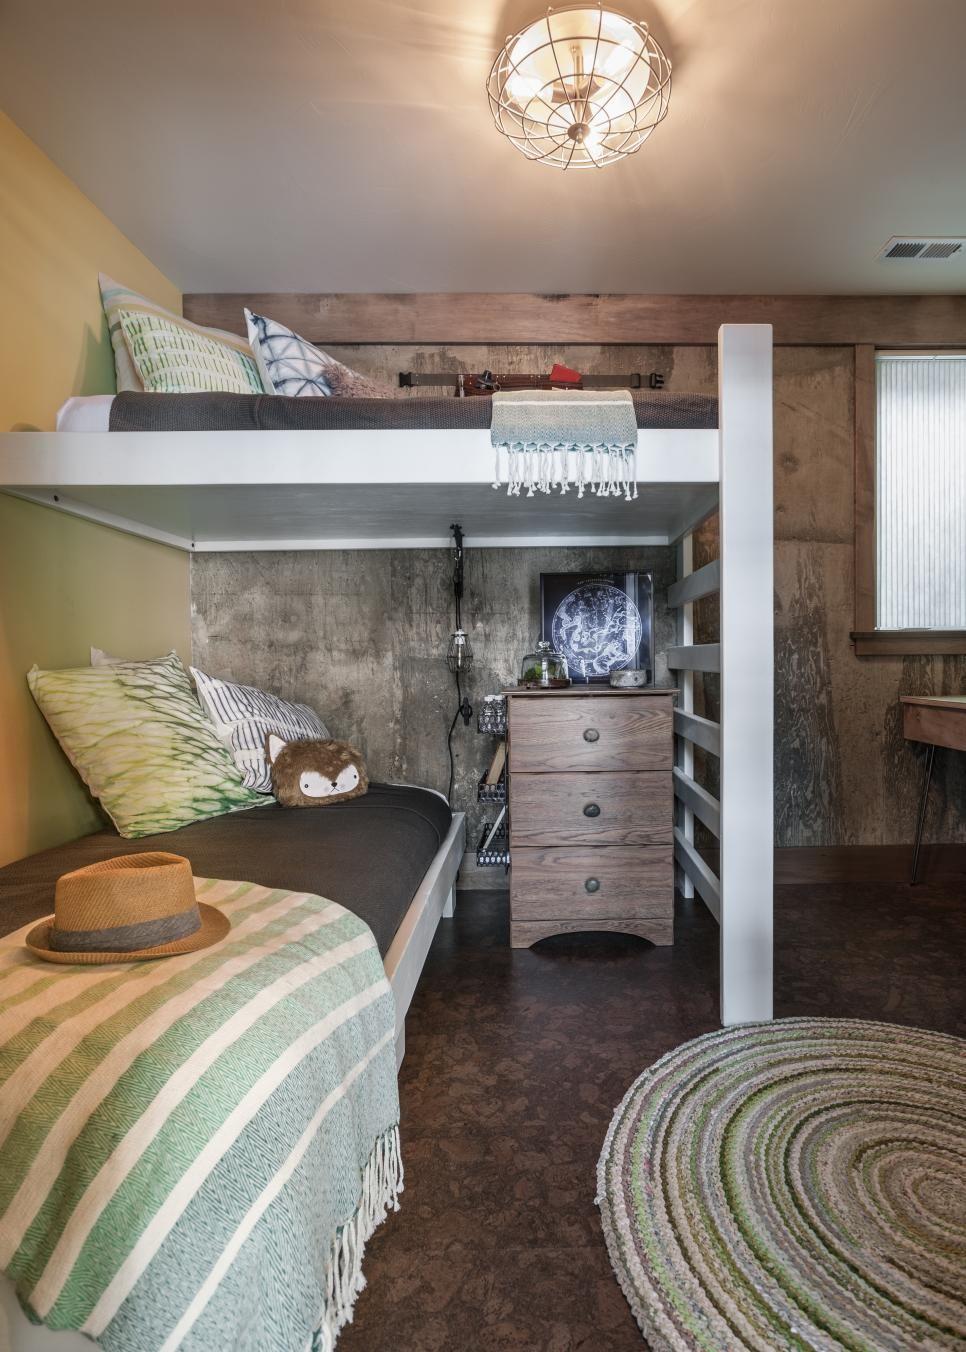 kids bunk bed and bunkroom design ideas furniture pinterest rh pinterest com